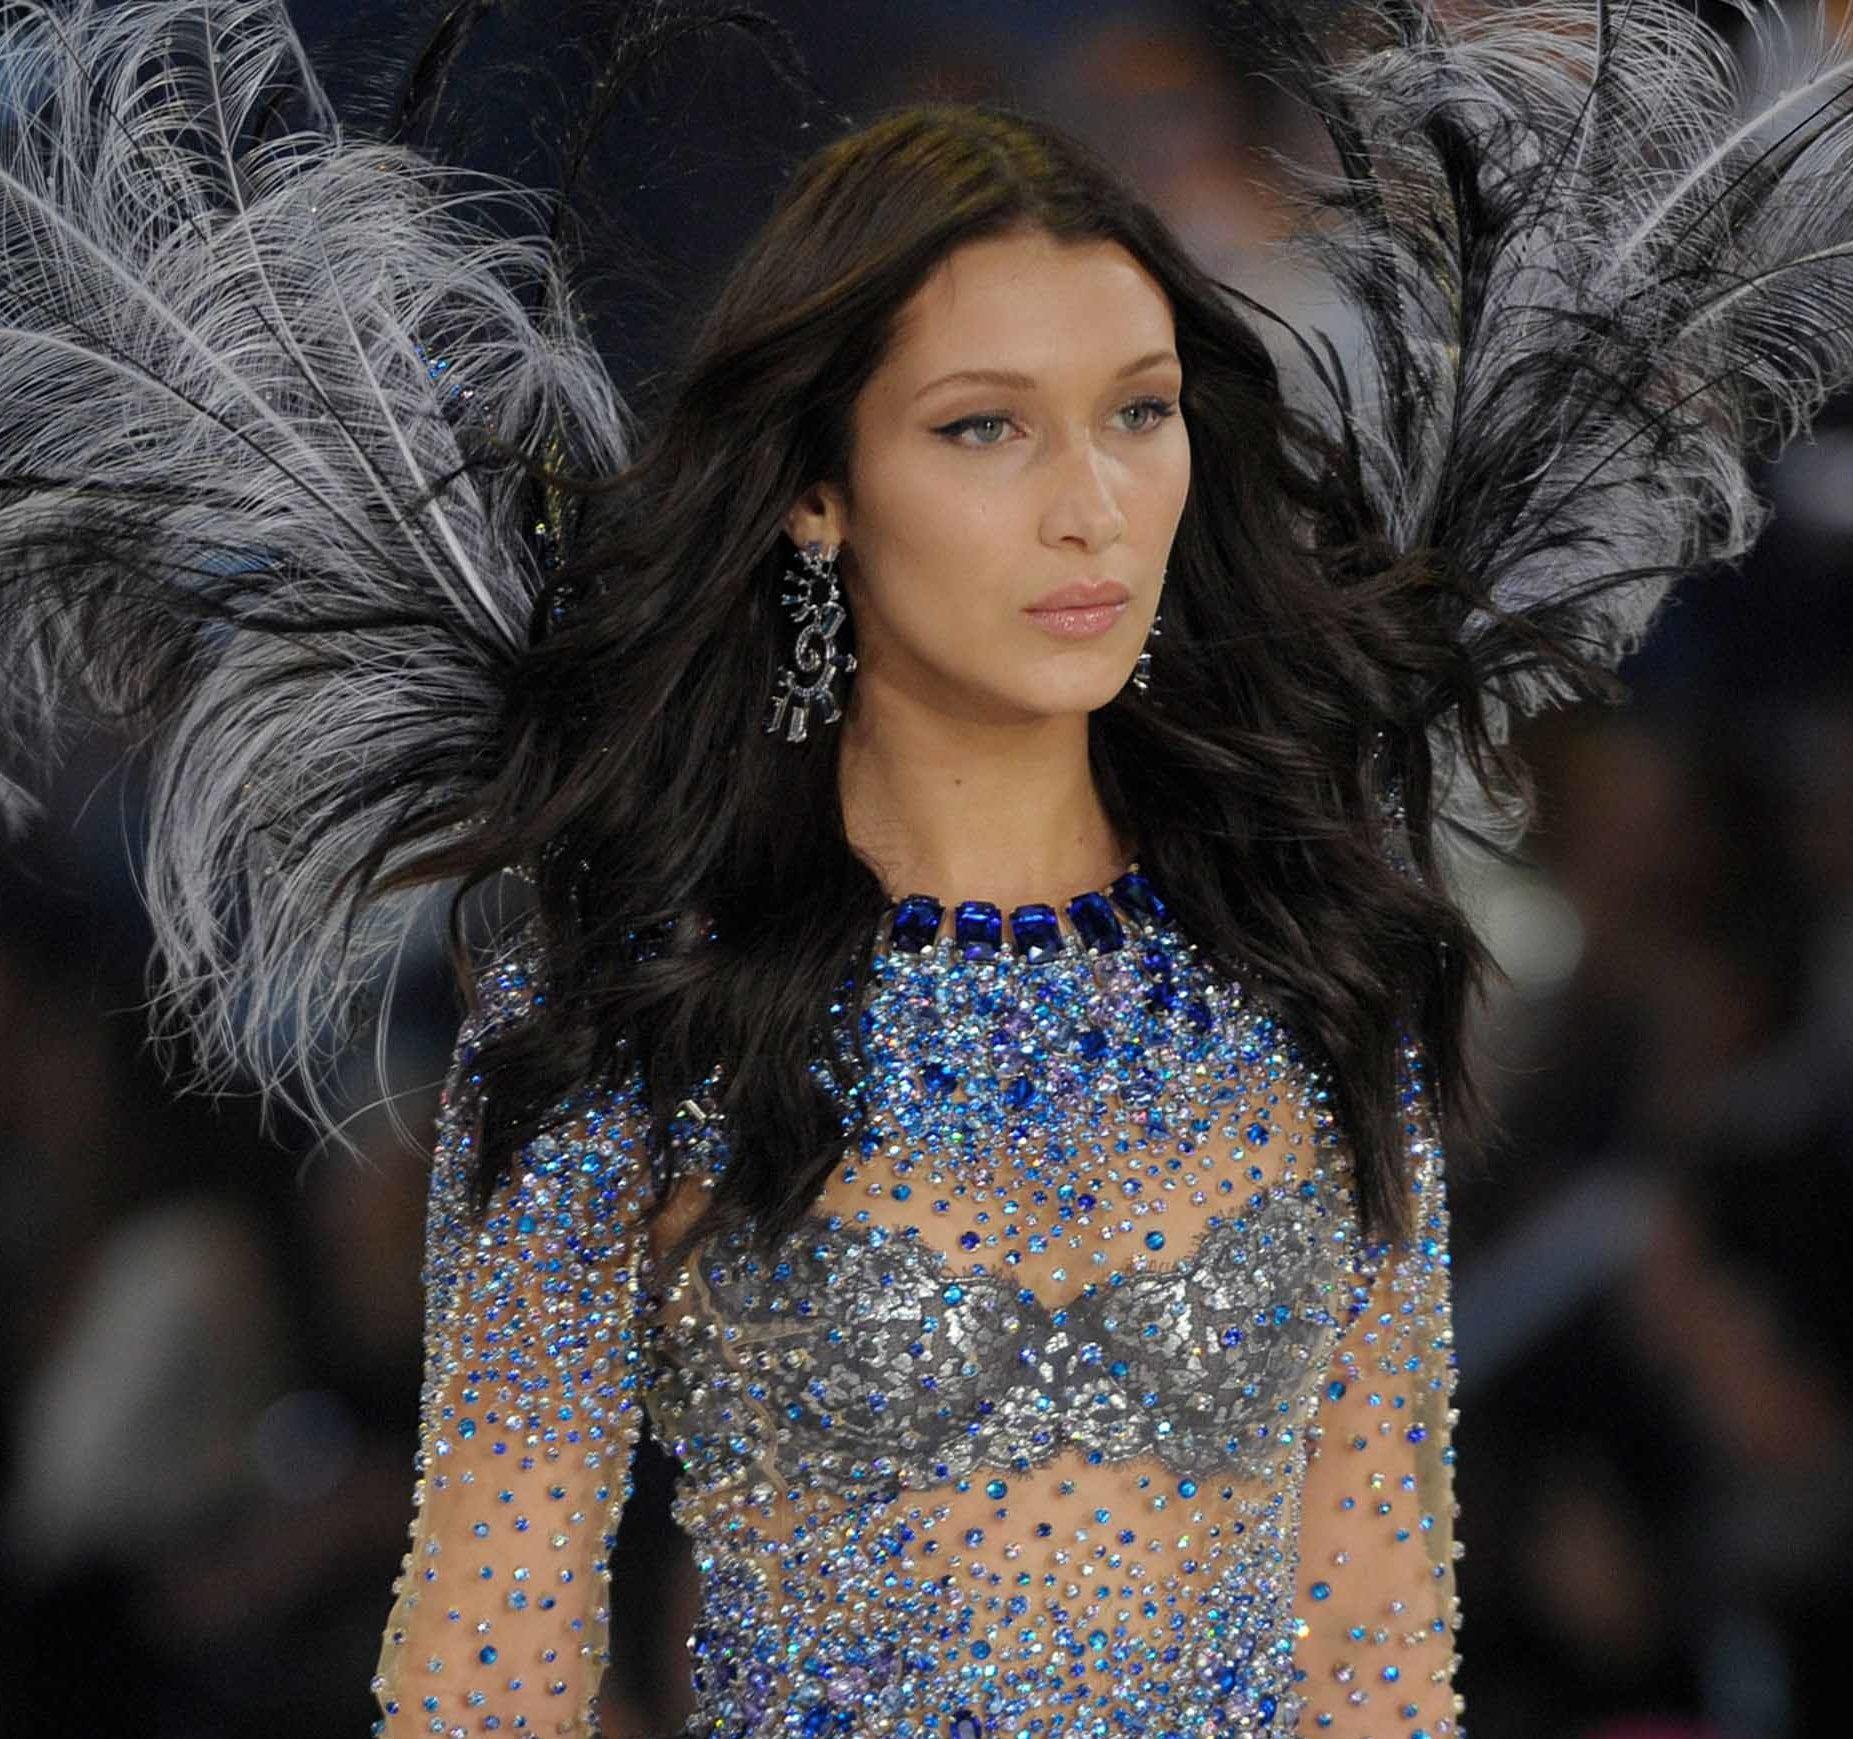 Victorias Secret Fashion Show 2016: All Things Hair - IMAGE - Bella Hadid long dark wavy hair